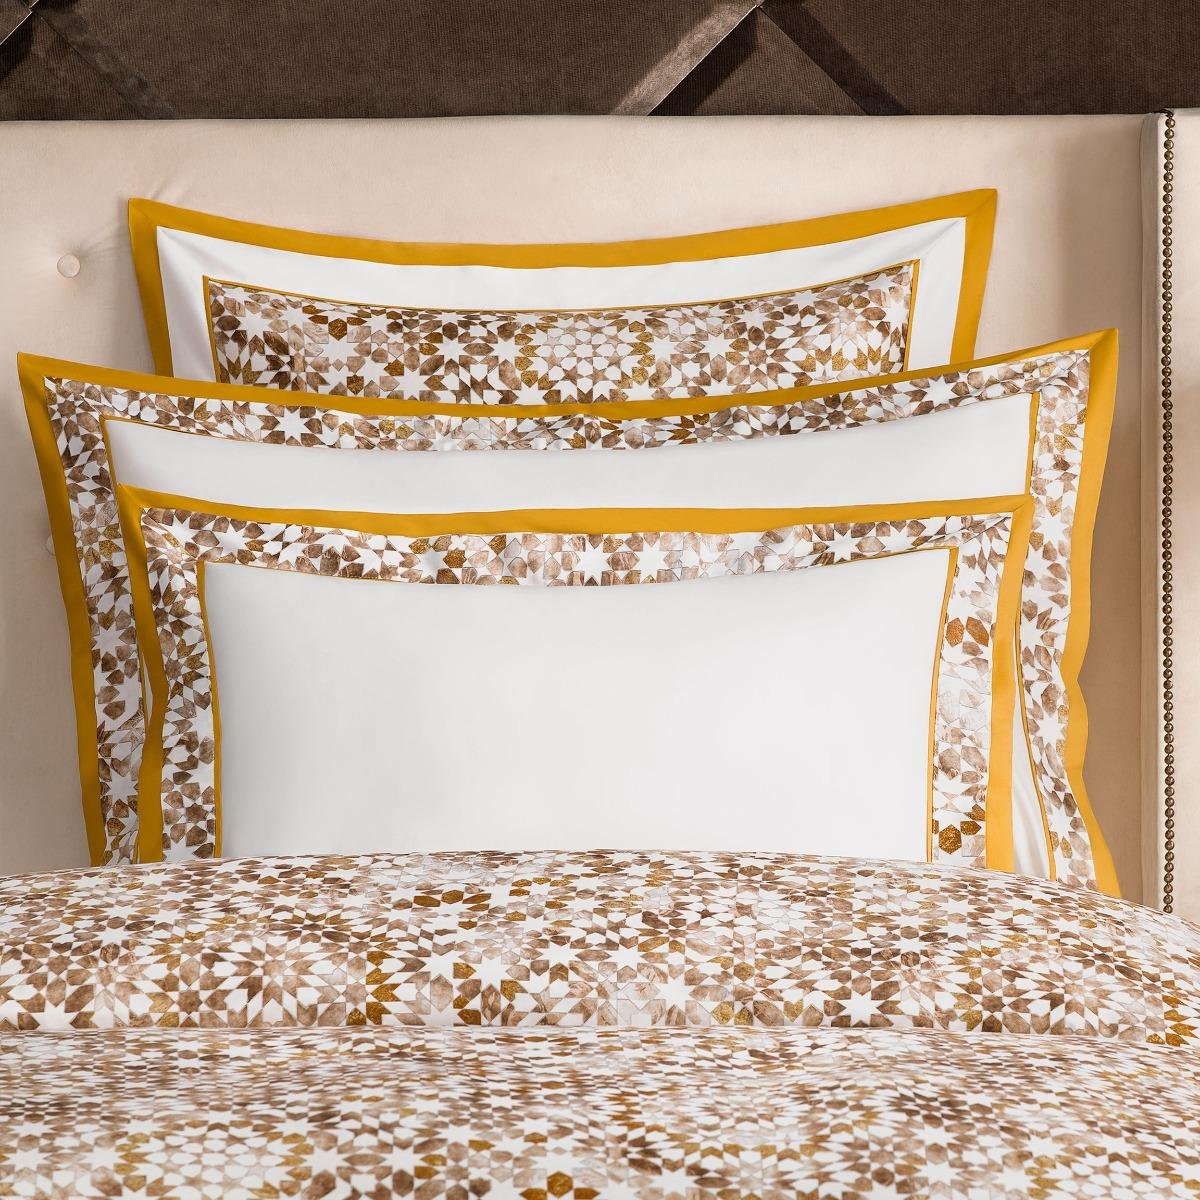 Наволочек комплект Togas нурим оранжевый 70х70. 2 пр комплект наволочек togas клэрити белый 70х70 2 пр